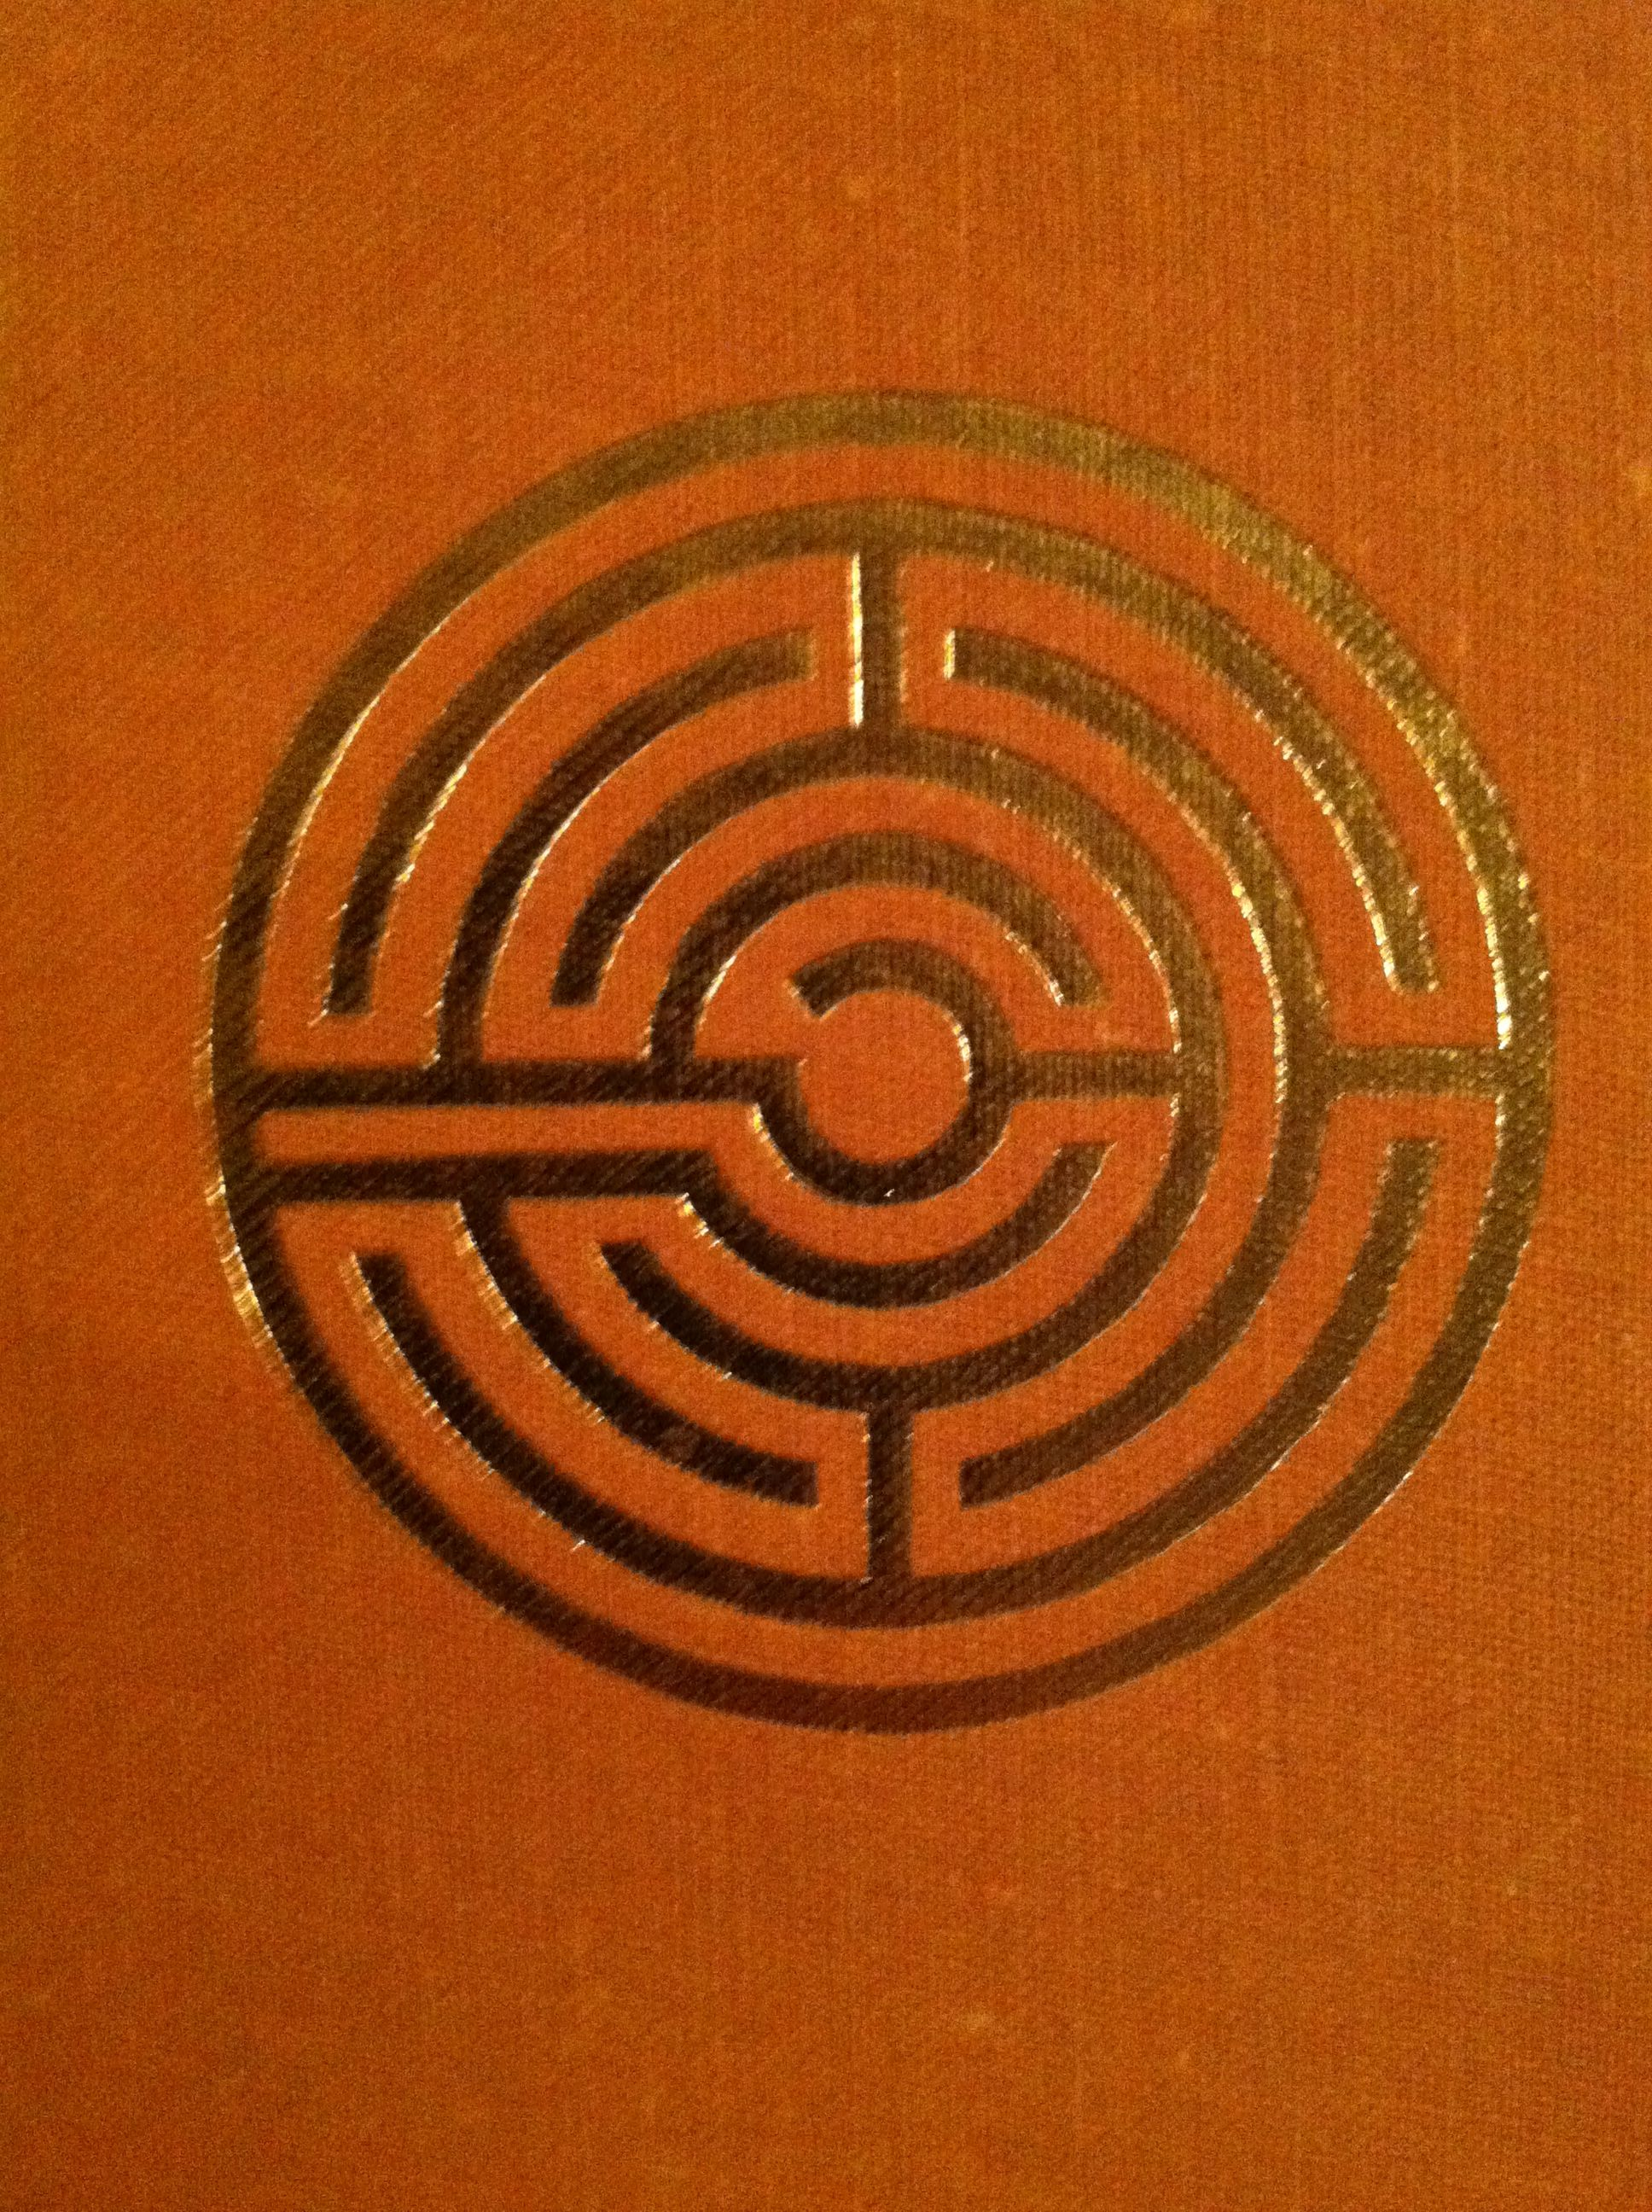 Carl Jung Man And His Symbols Symbolism Old Celtic And Pagan